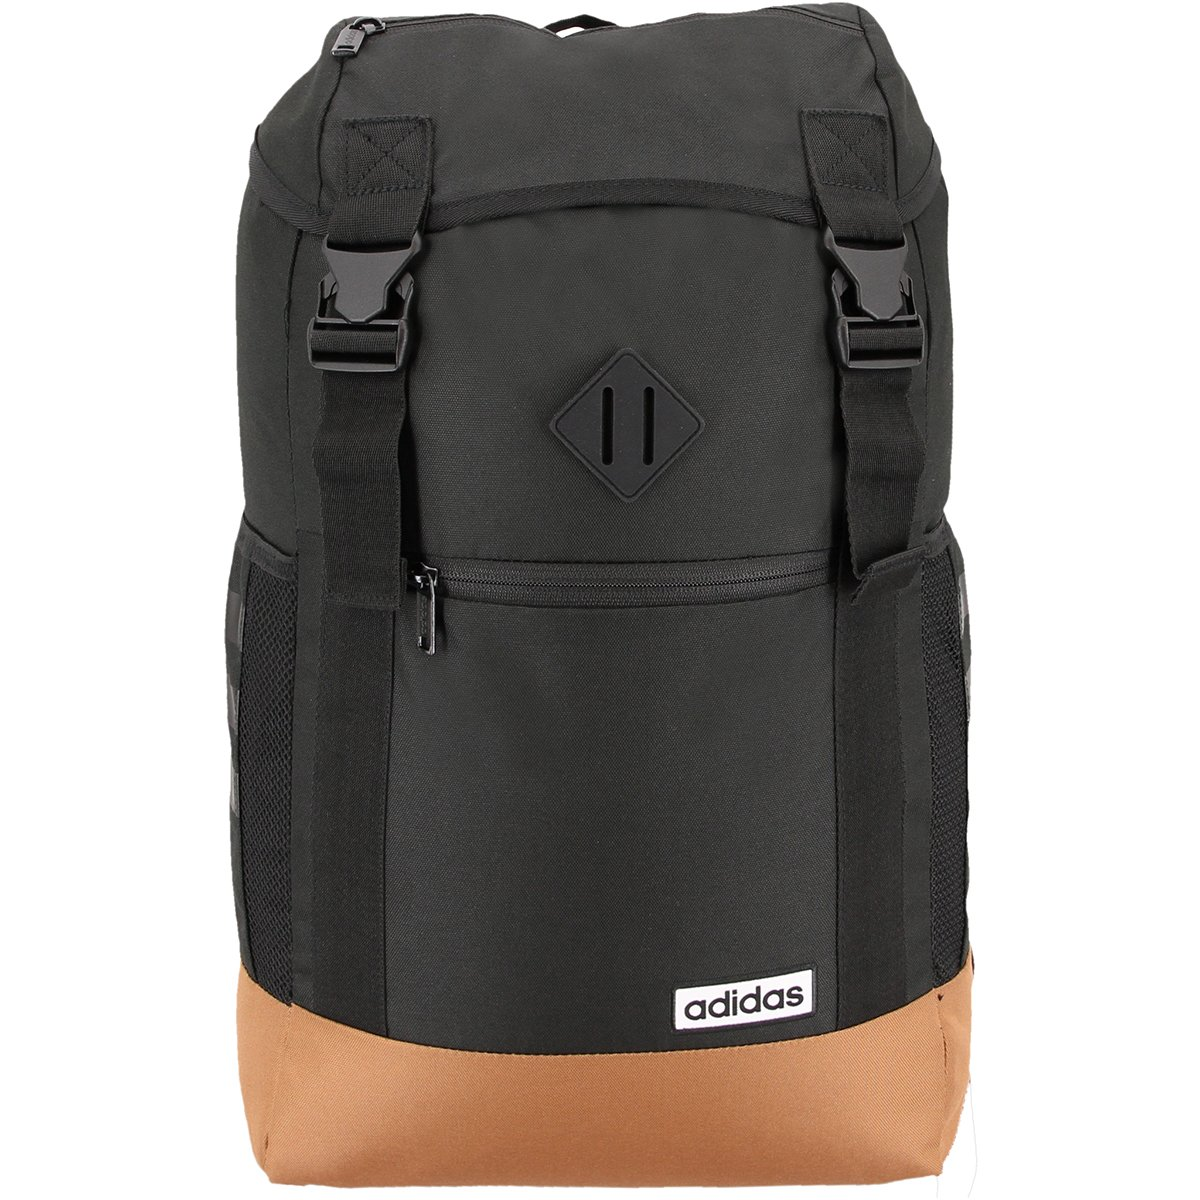 a70d90bd5c Sports Direct Adidas School Bags